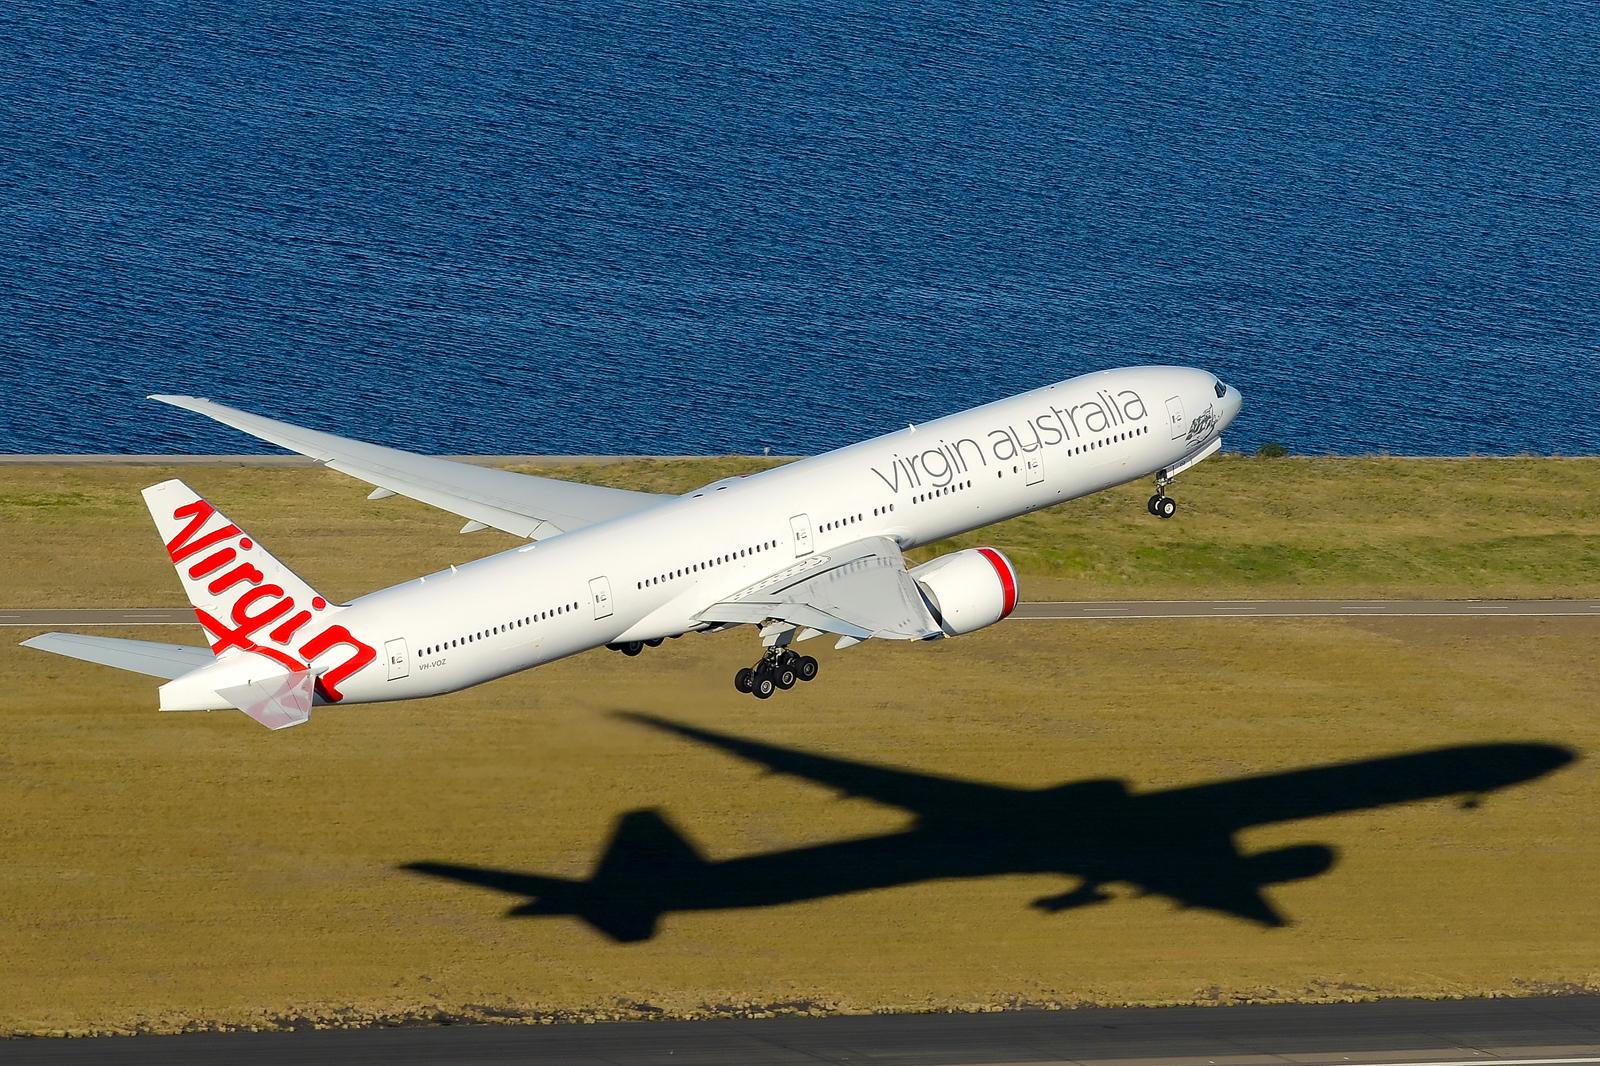 Virgin Australia 777 (Damien Aiello)